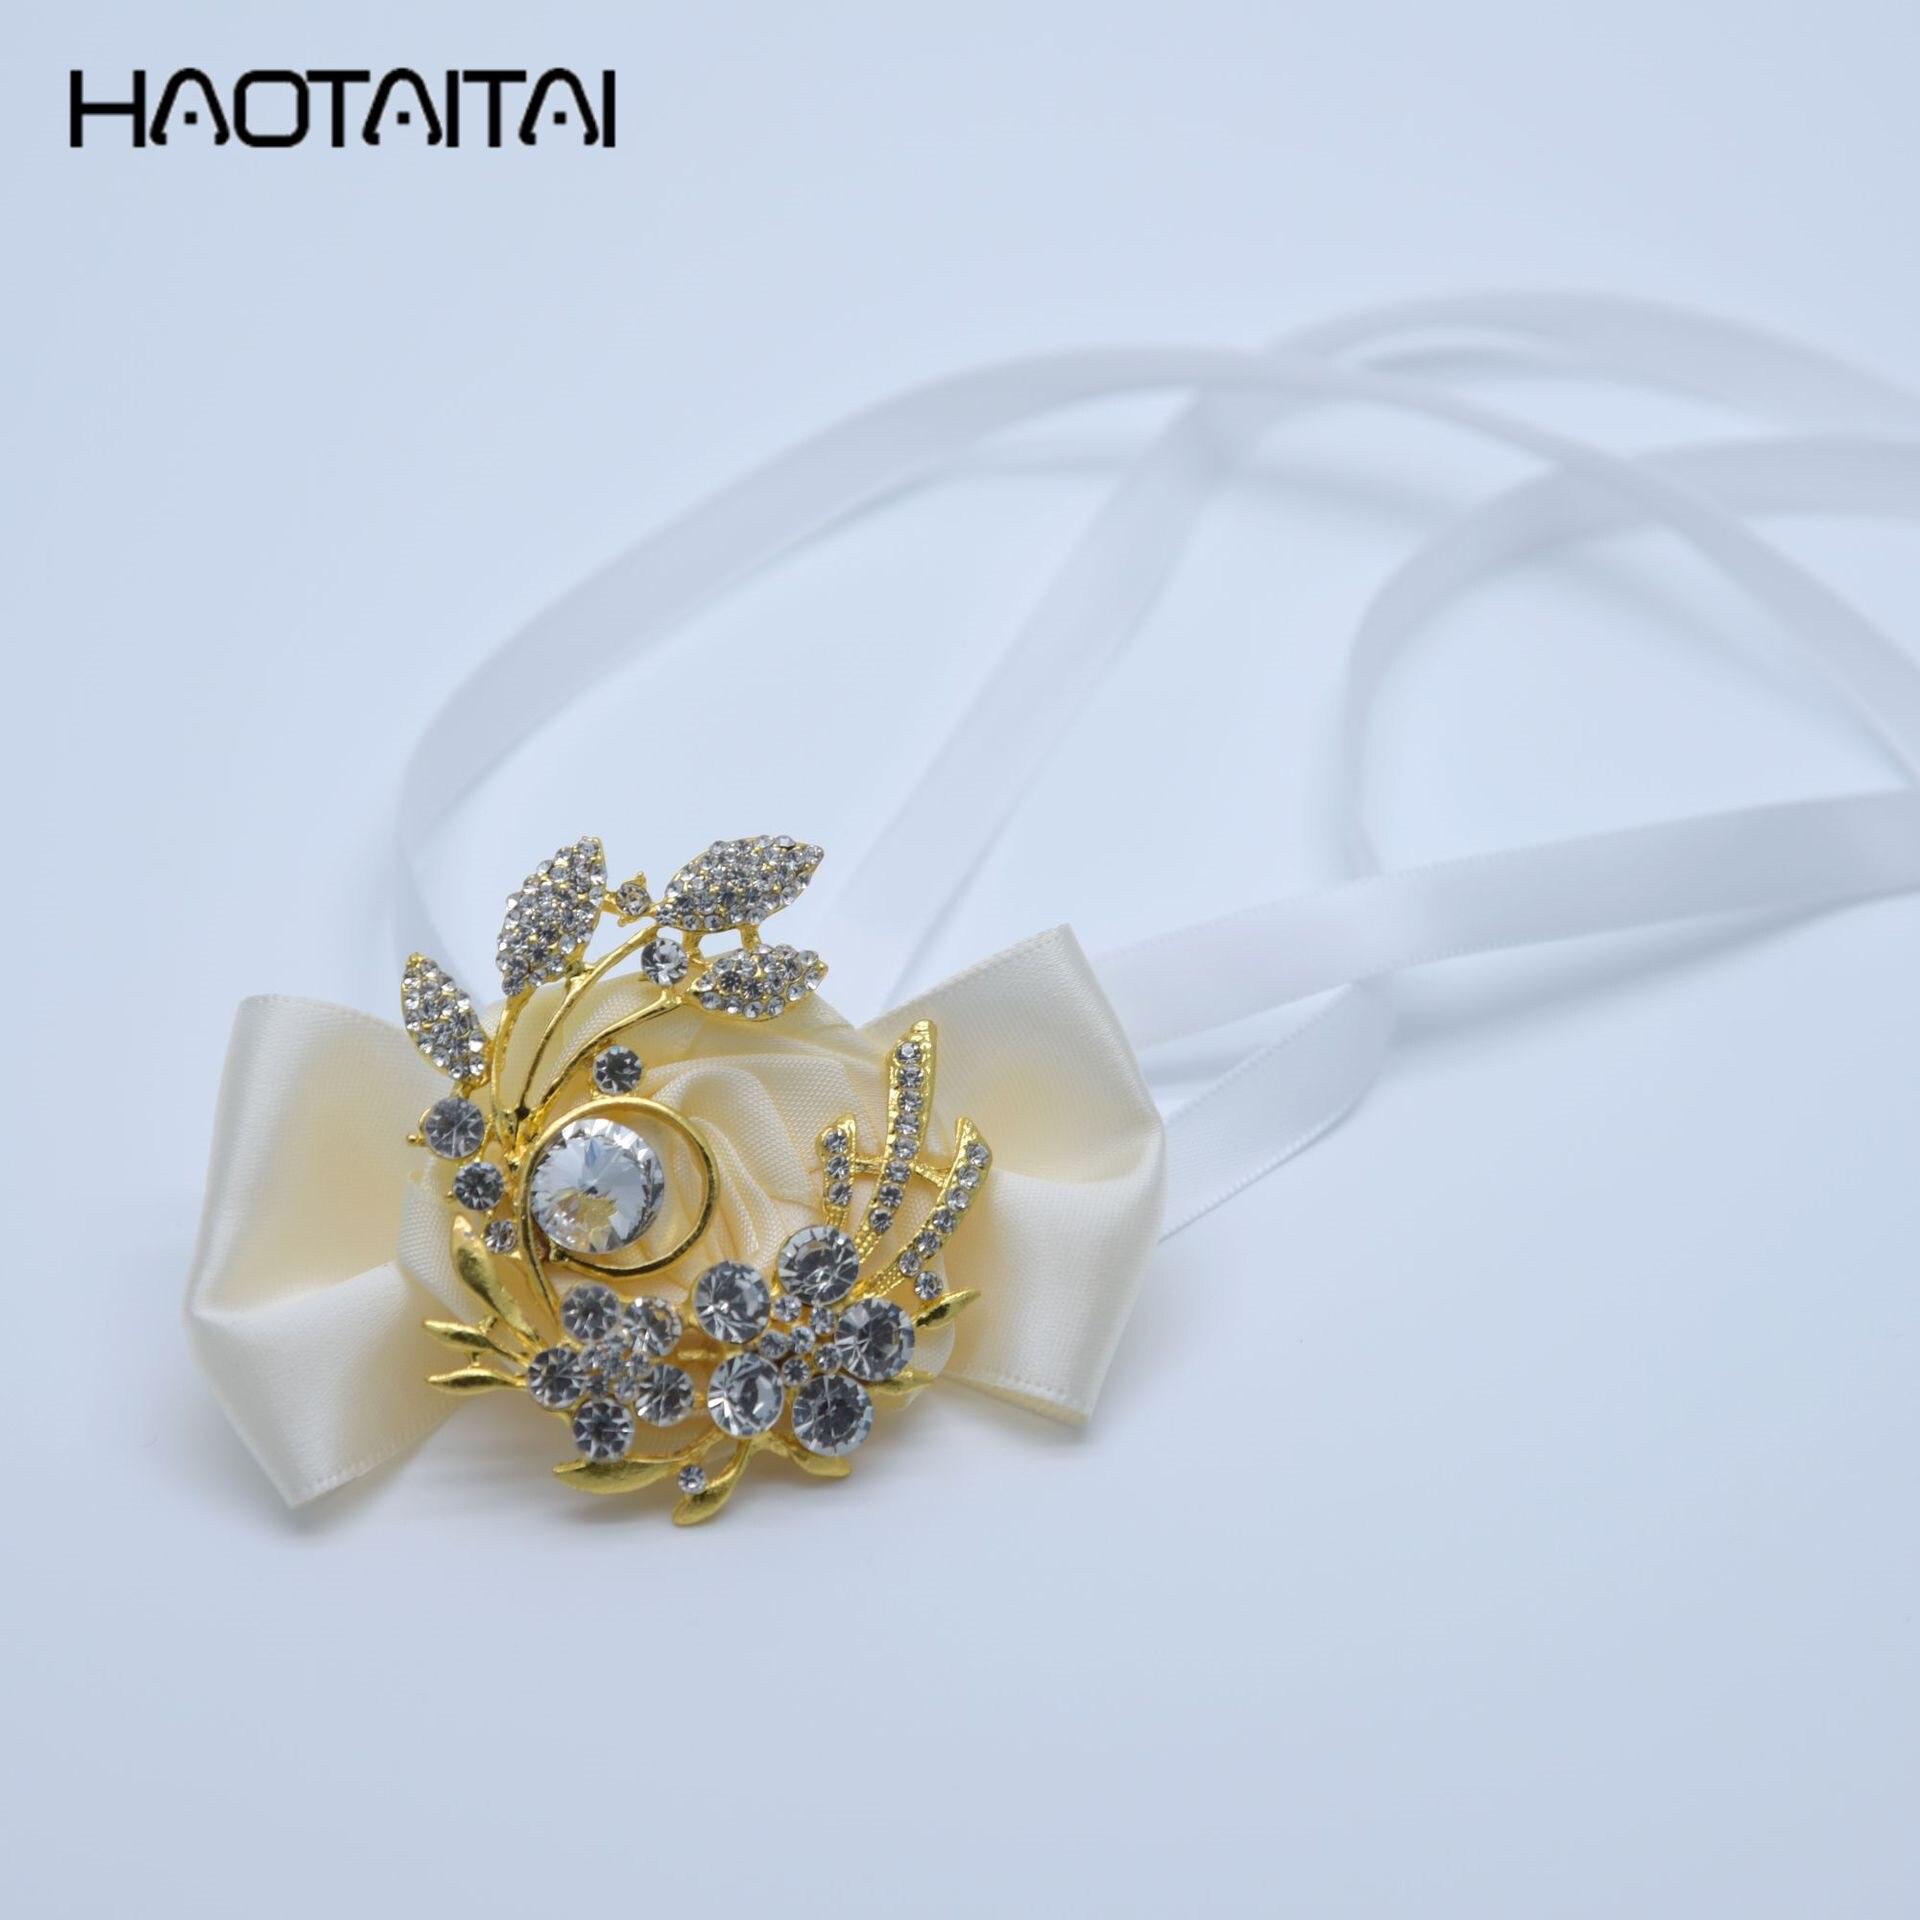 Wrist Corsages Silk Flower Bracelet Prom Hand Flowers Wedding Bride